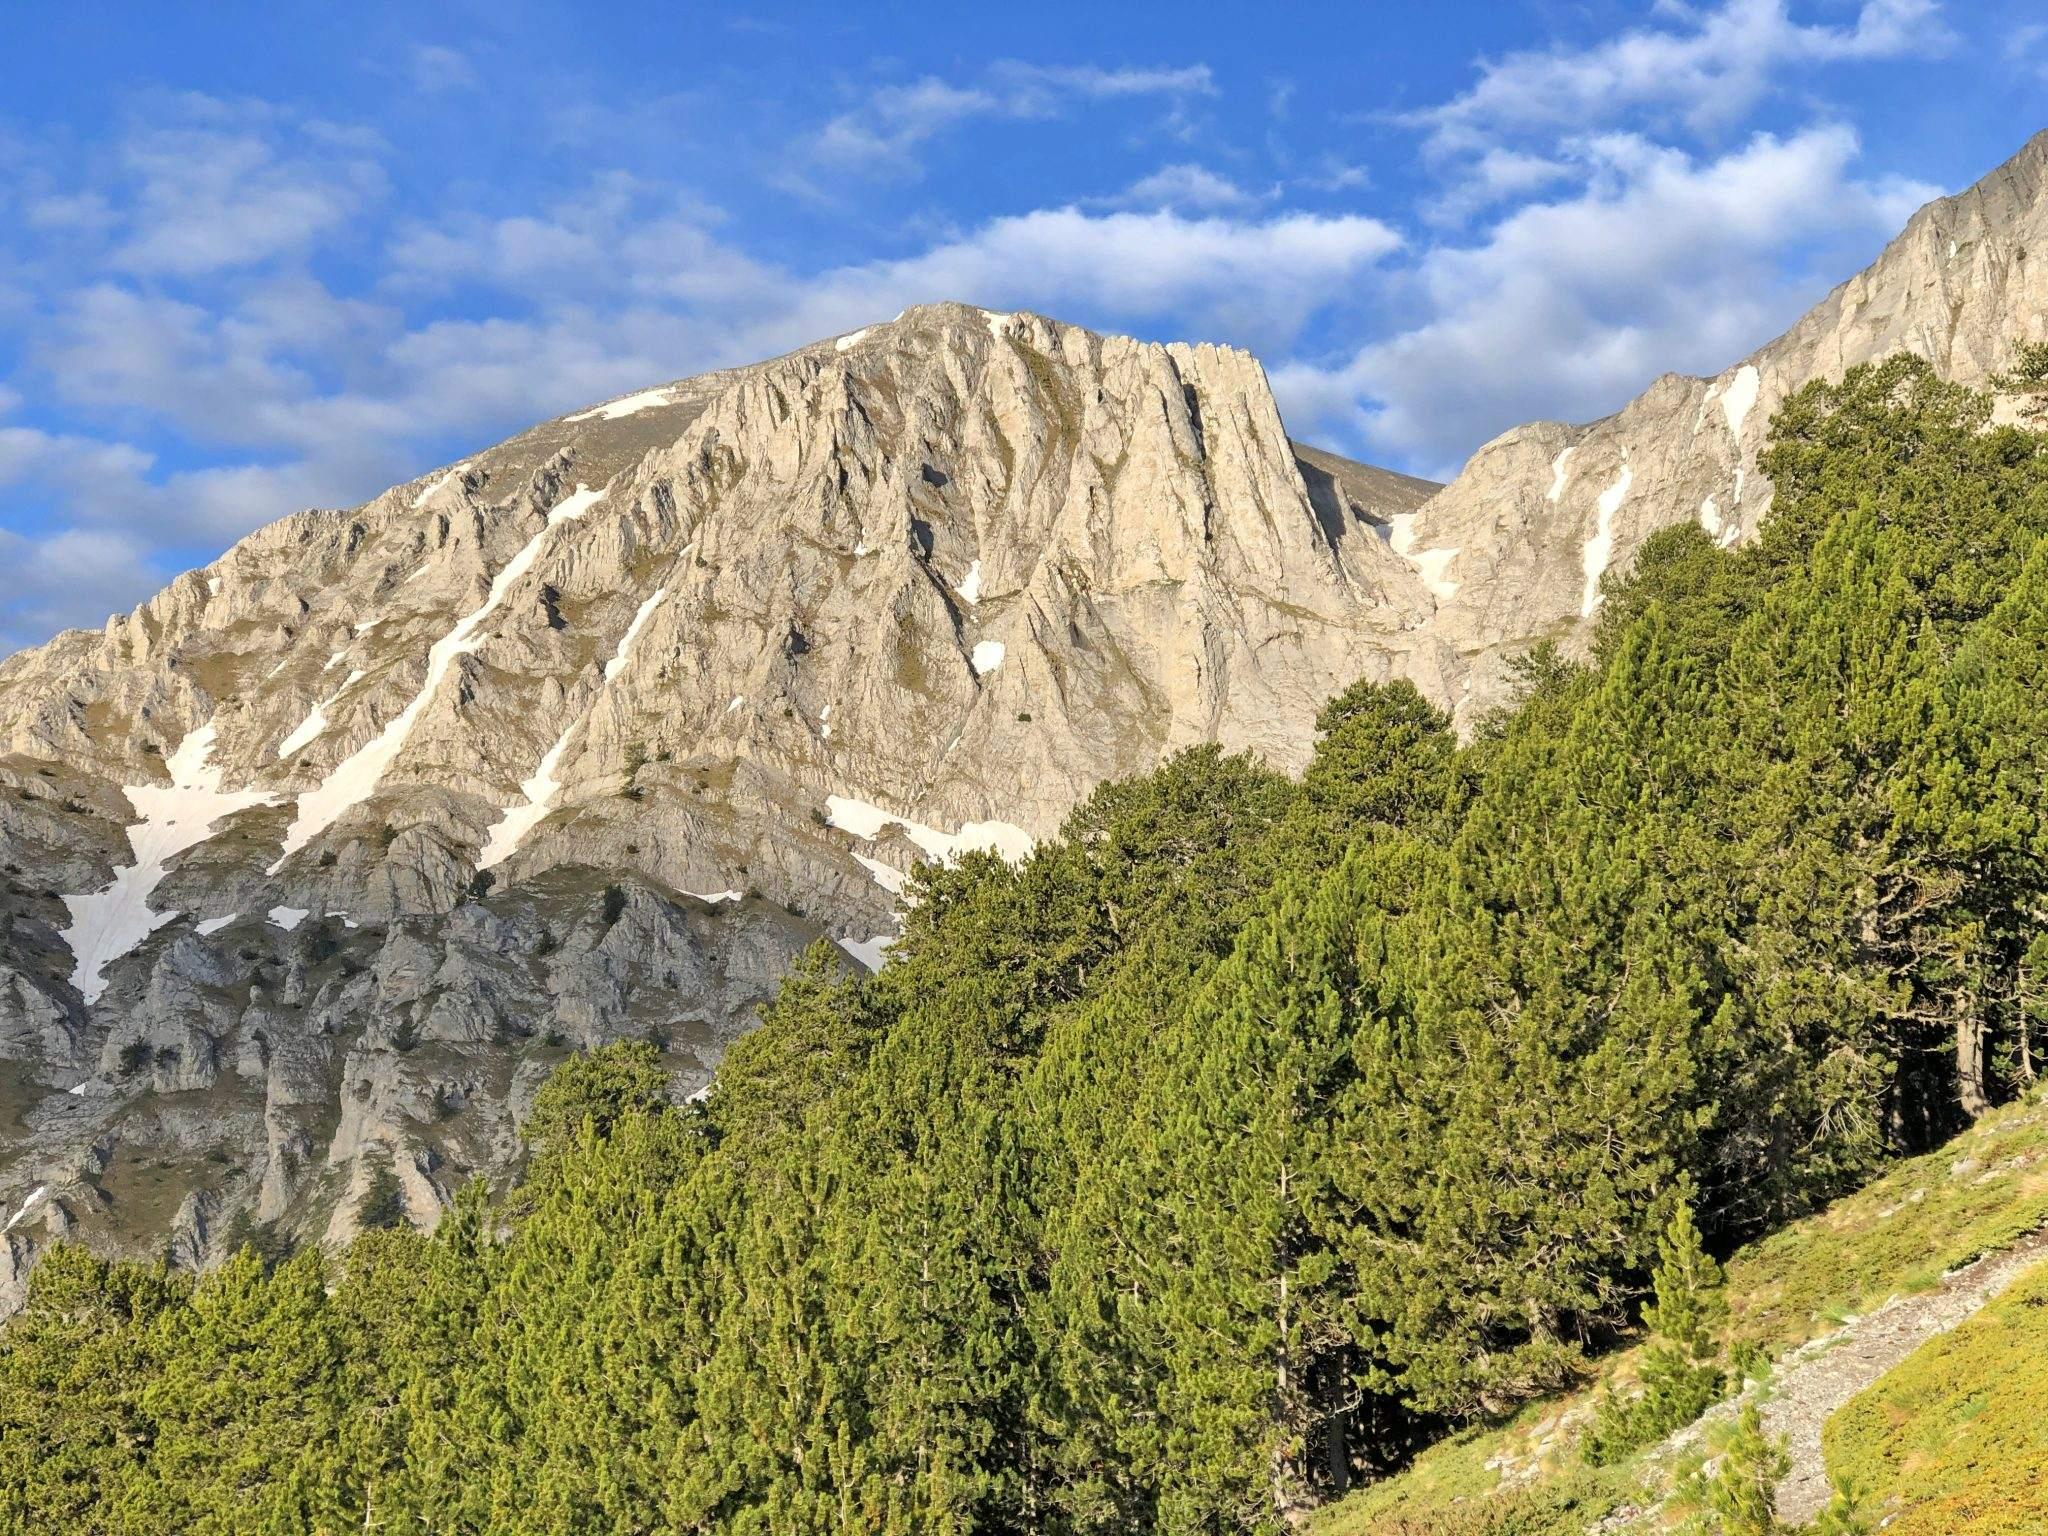 Boomgrens Mt Olympus Noord-Griekenland